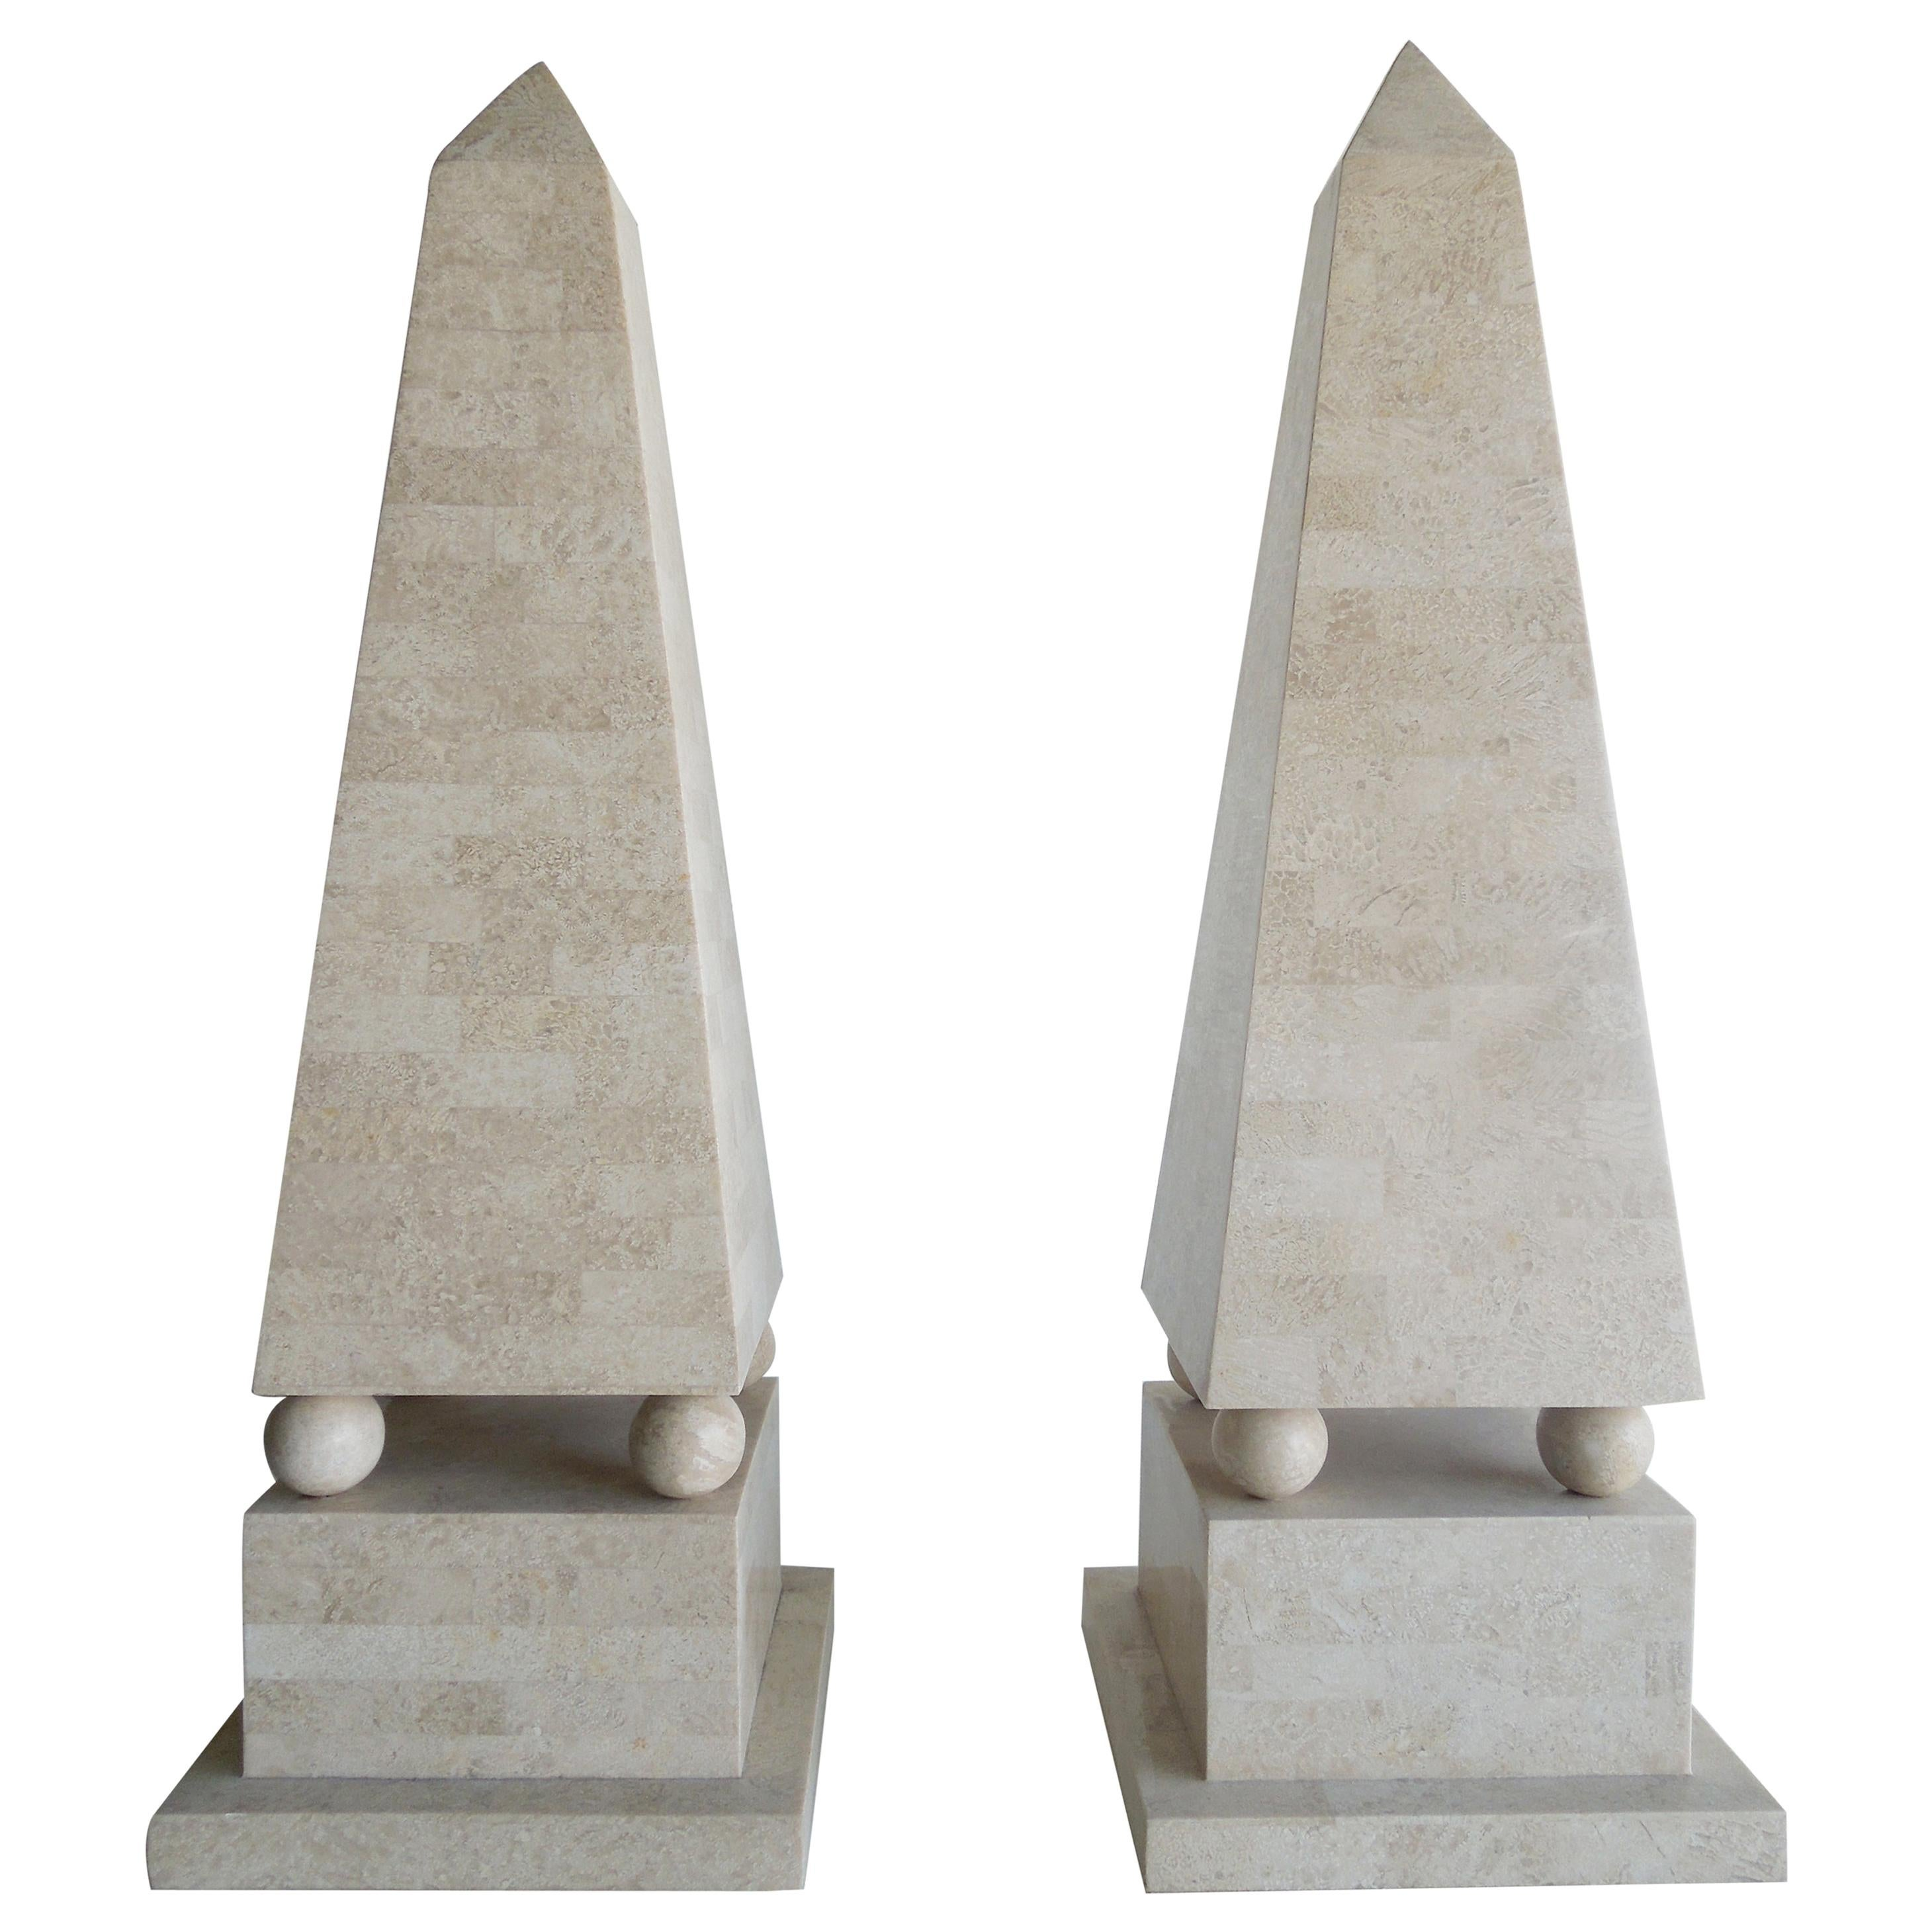 Maitland Smith Modernist Tessellated Stone Obelisks, Pair